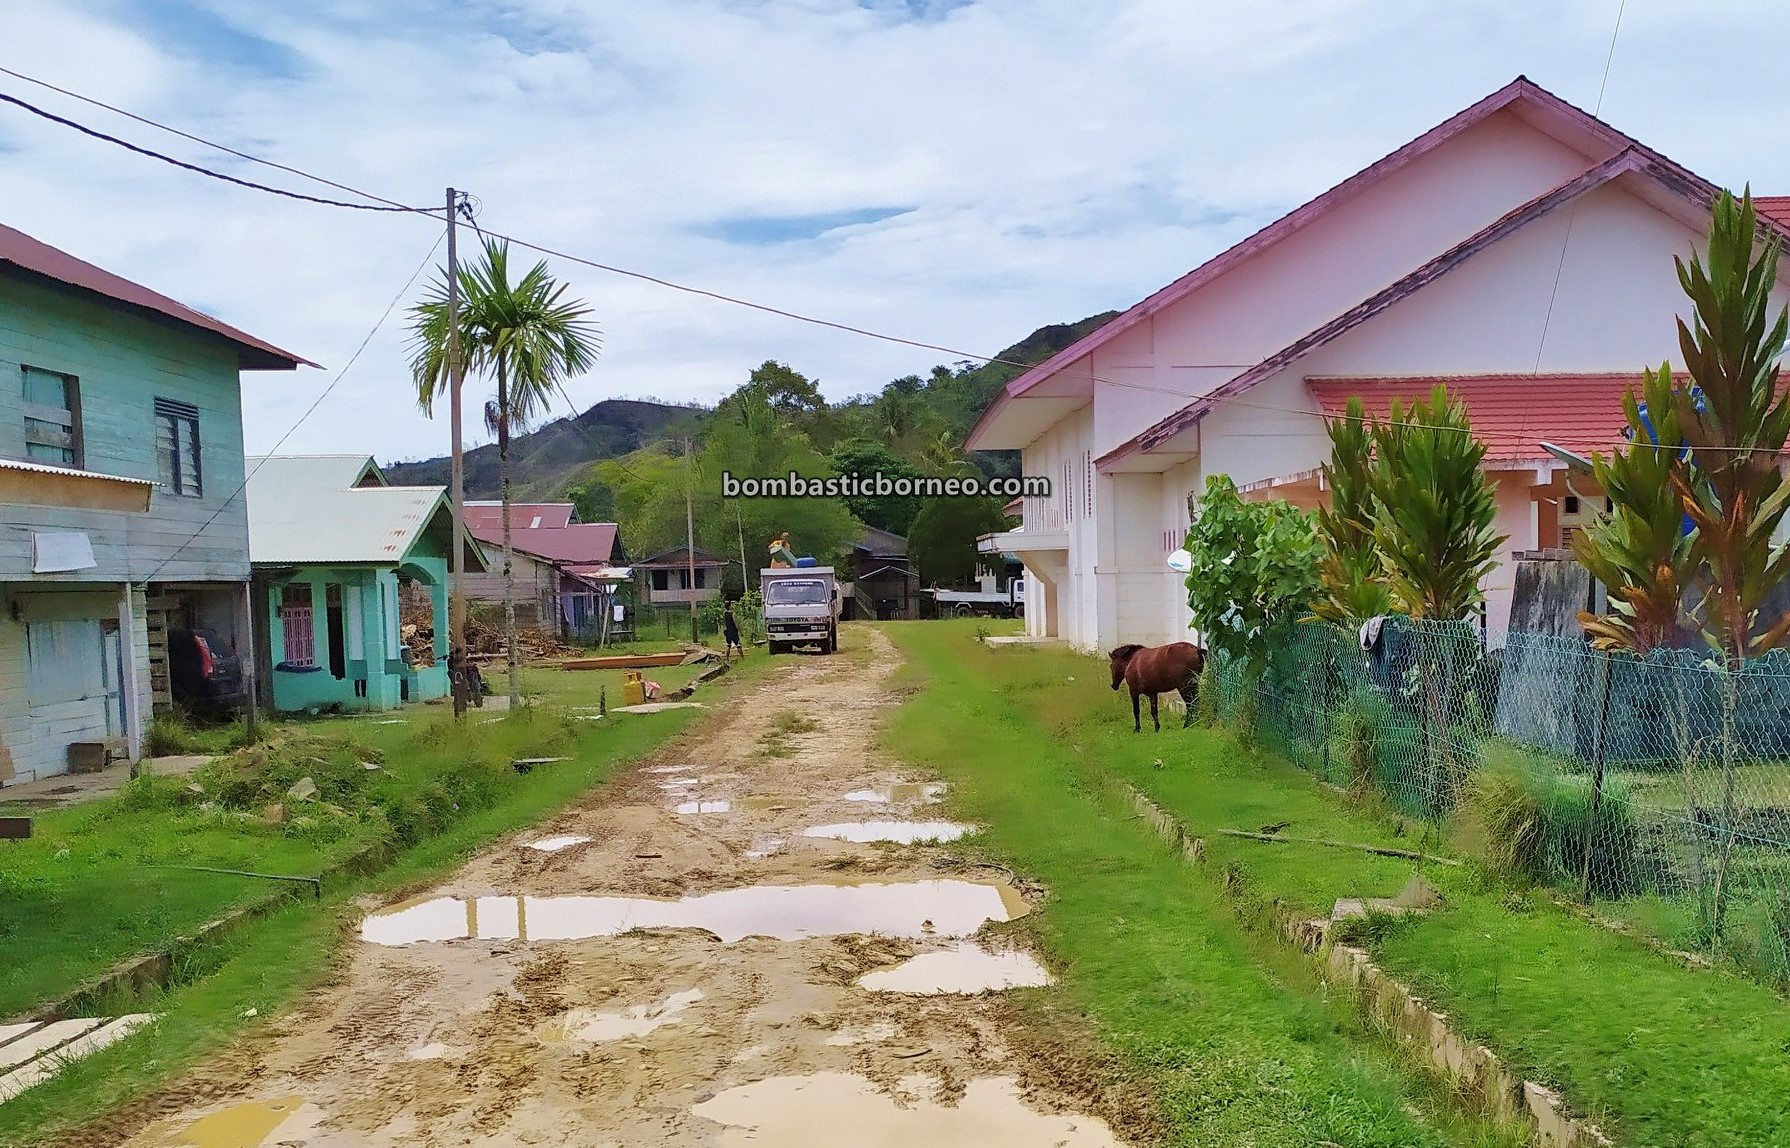 North Kalimantan, Nunukan, Krayan, adventure, backpackers, destination, Interior Village, Highlands, native, Suku Dayak Lundayeh, travel guide, Borneo, 探索婆罗洲游踪, 北加里曼丹弄达耶族, 印尼内陆高原